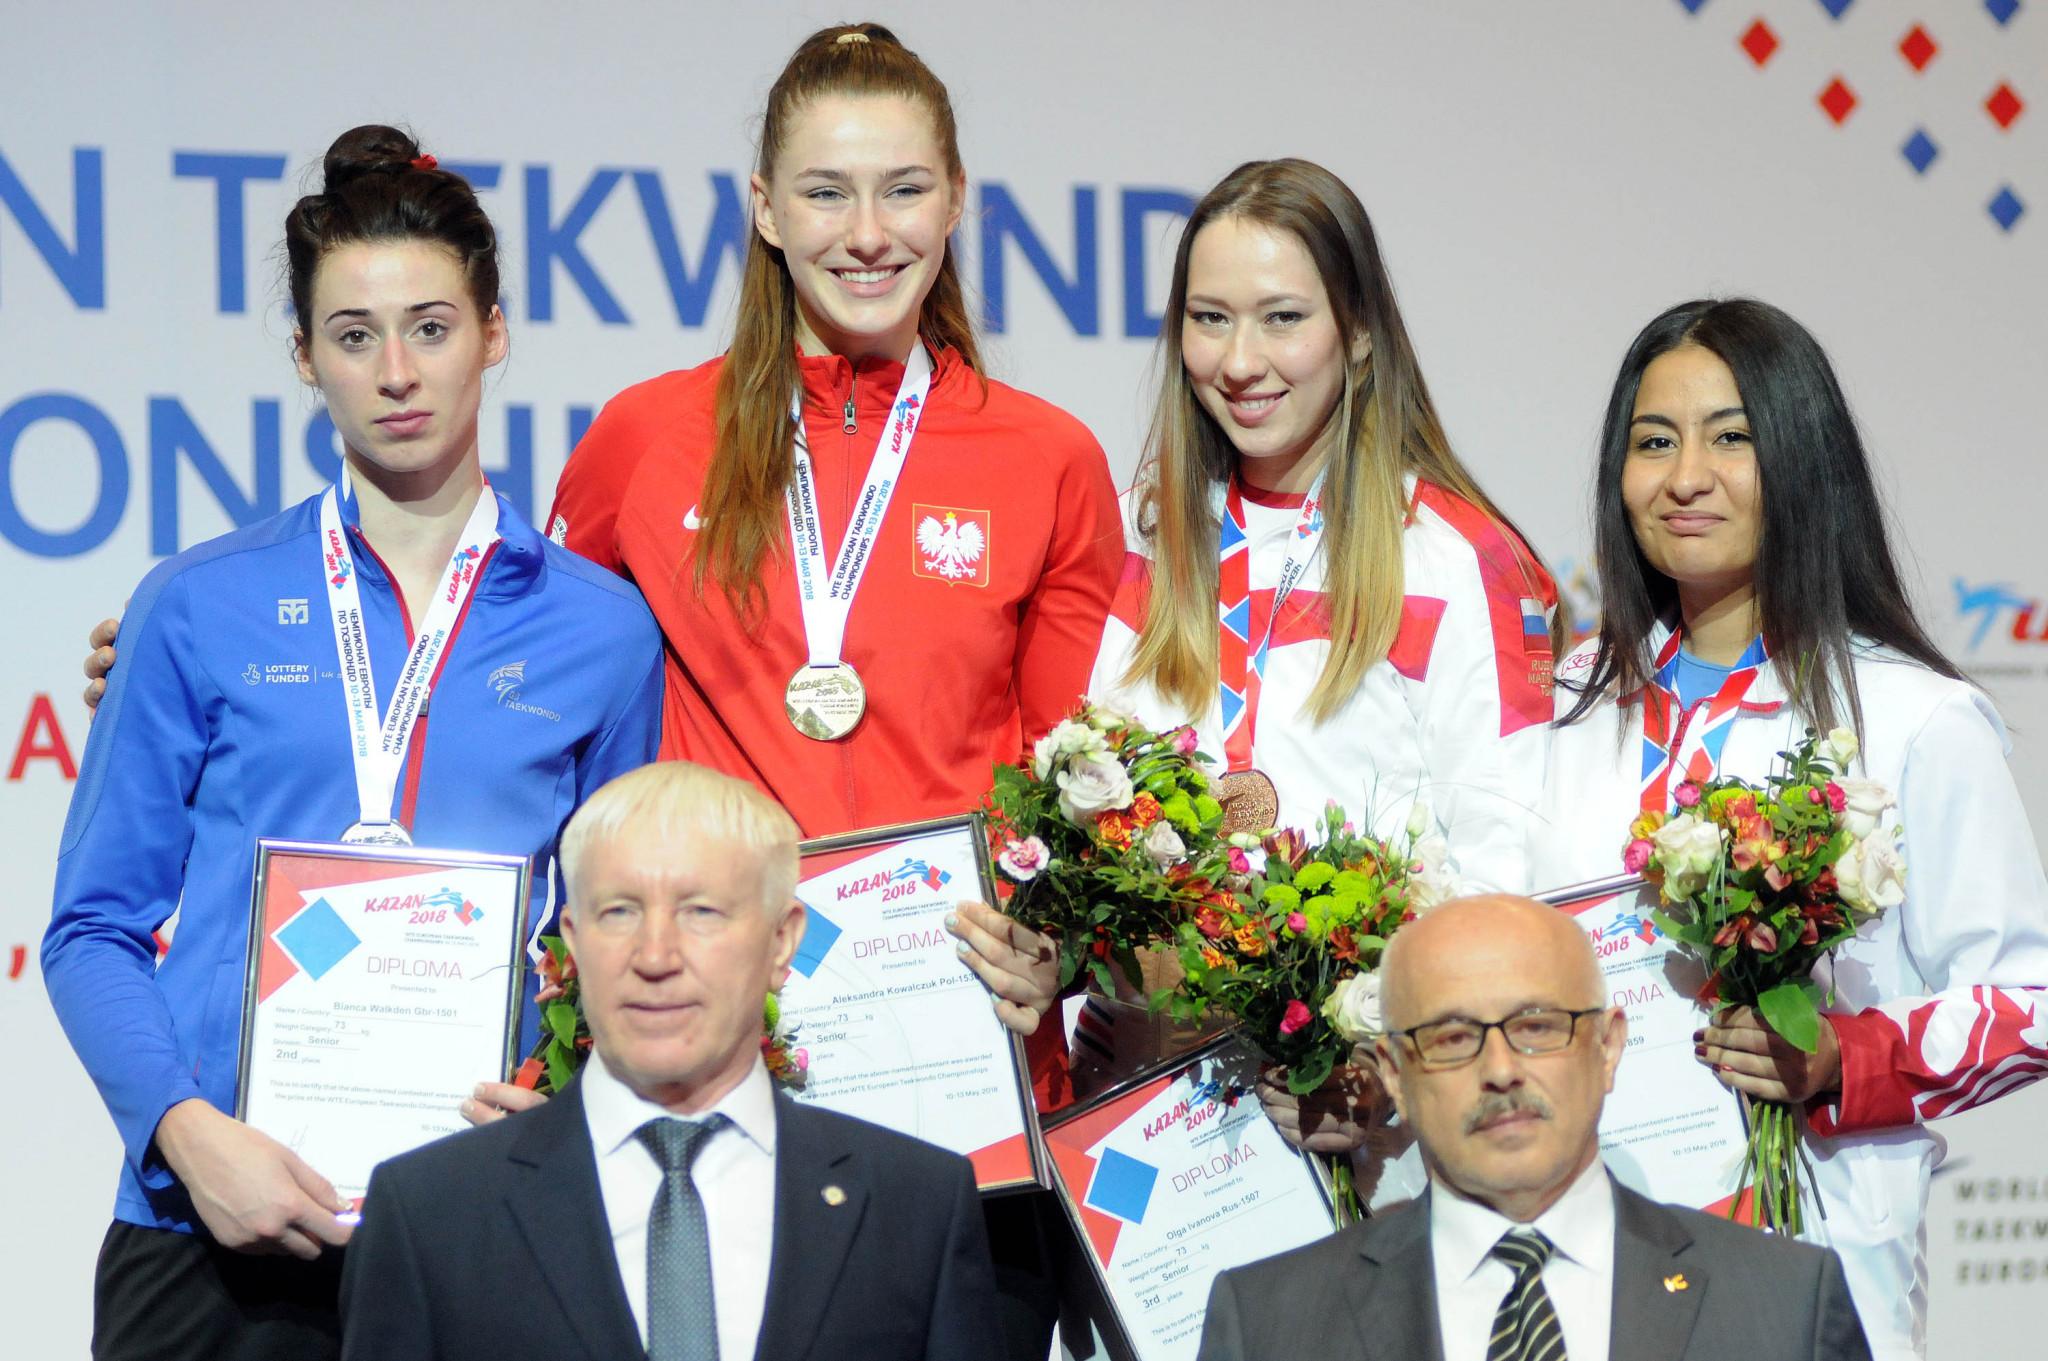 Kowalczuk upsets Walkden to claim gold at European Taekwondo Championships